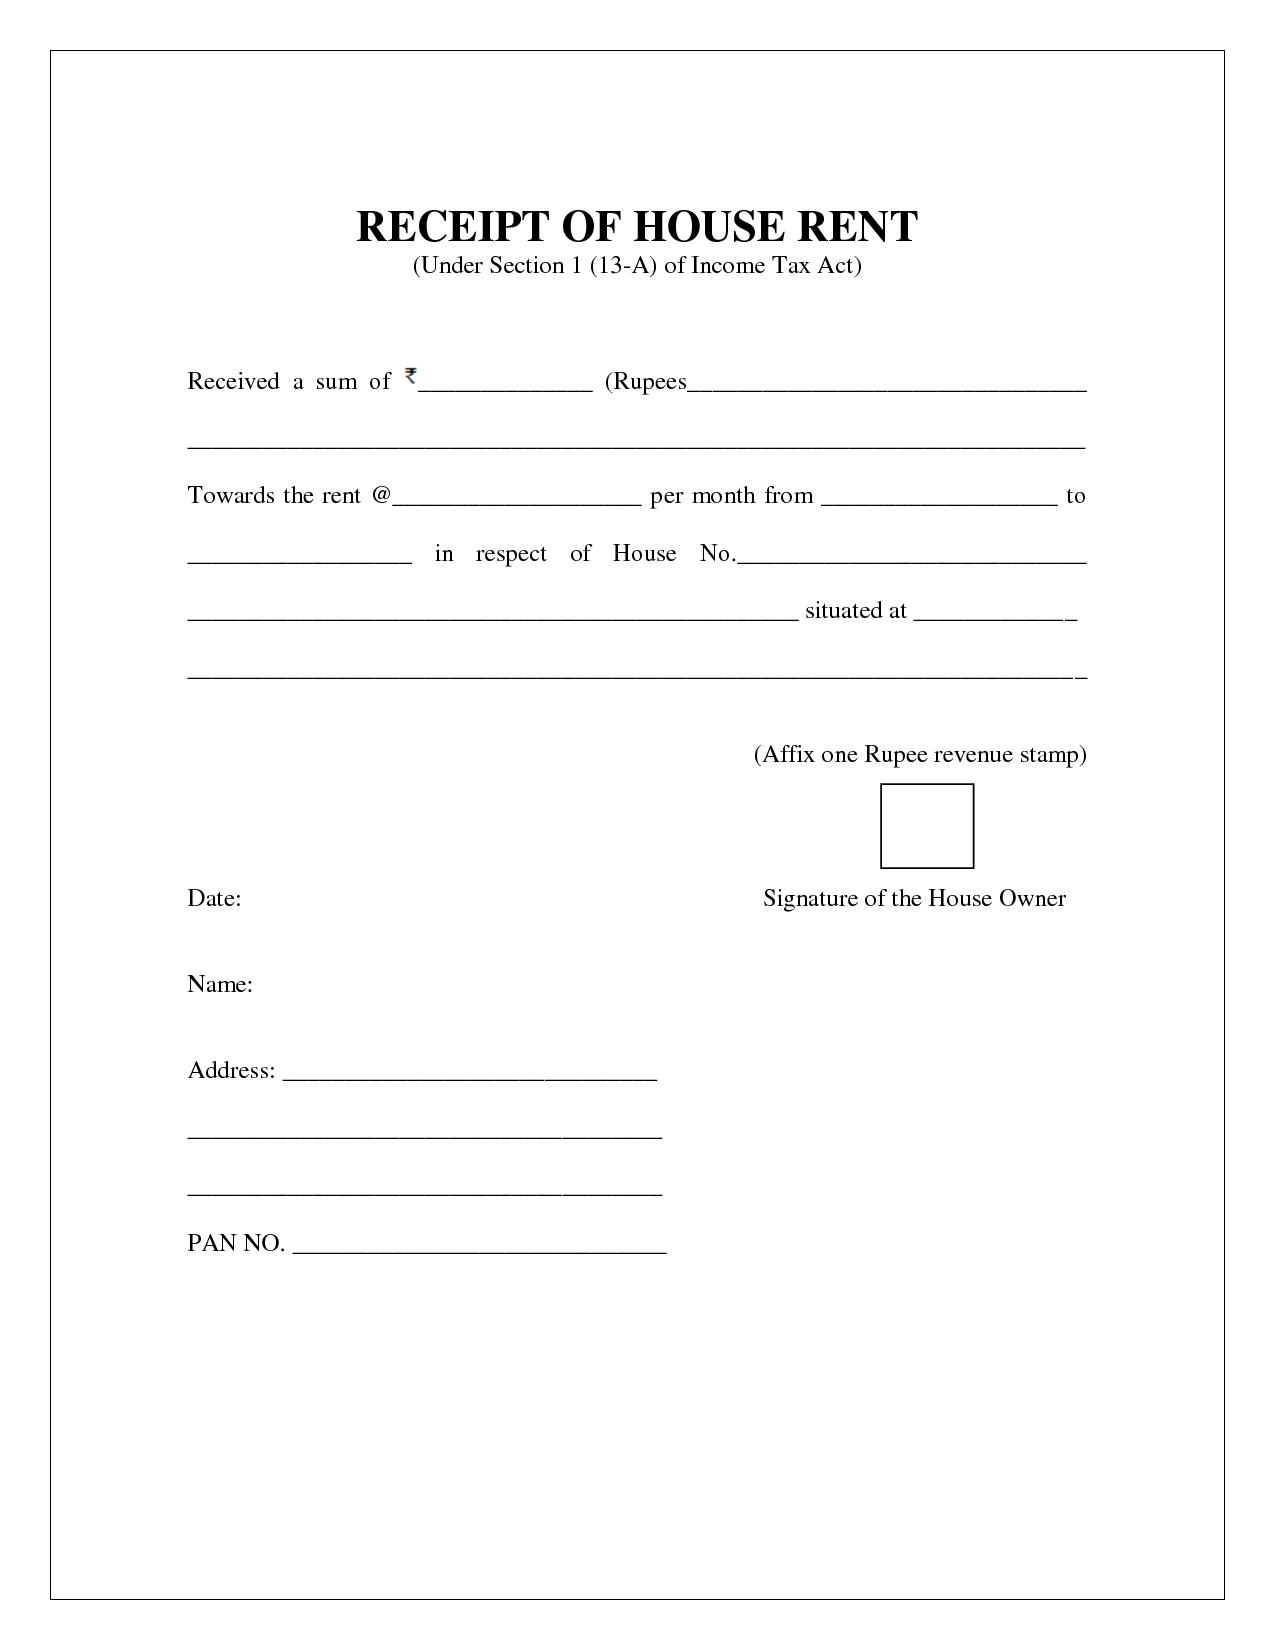 Free House Rental Invoice House Rent Receipt Https 75maingroup Com Rent Agreement Format Receipt Template Invoice Template Word Invoice Template